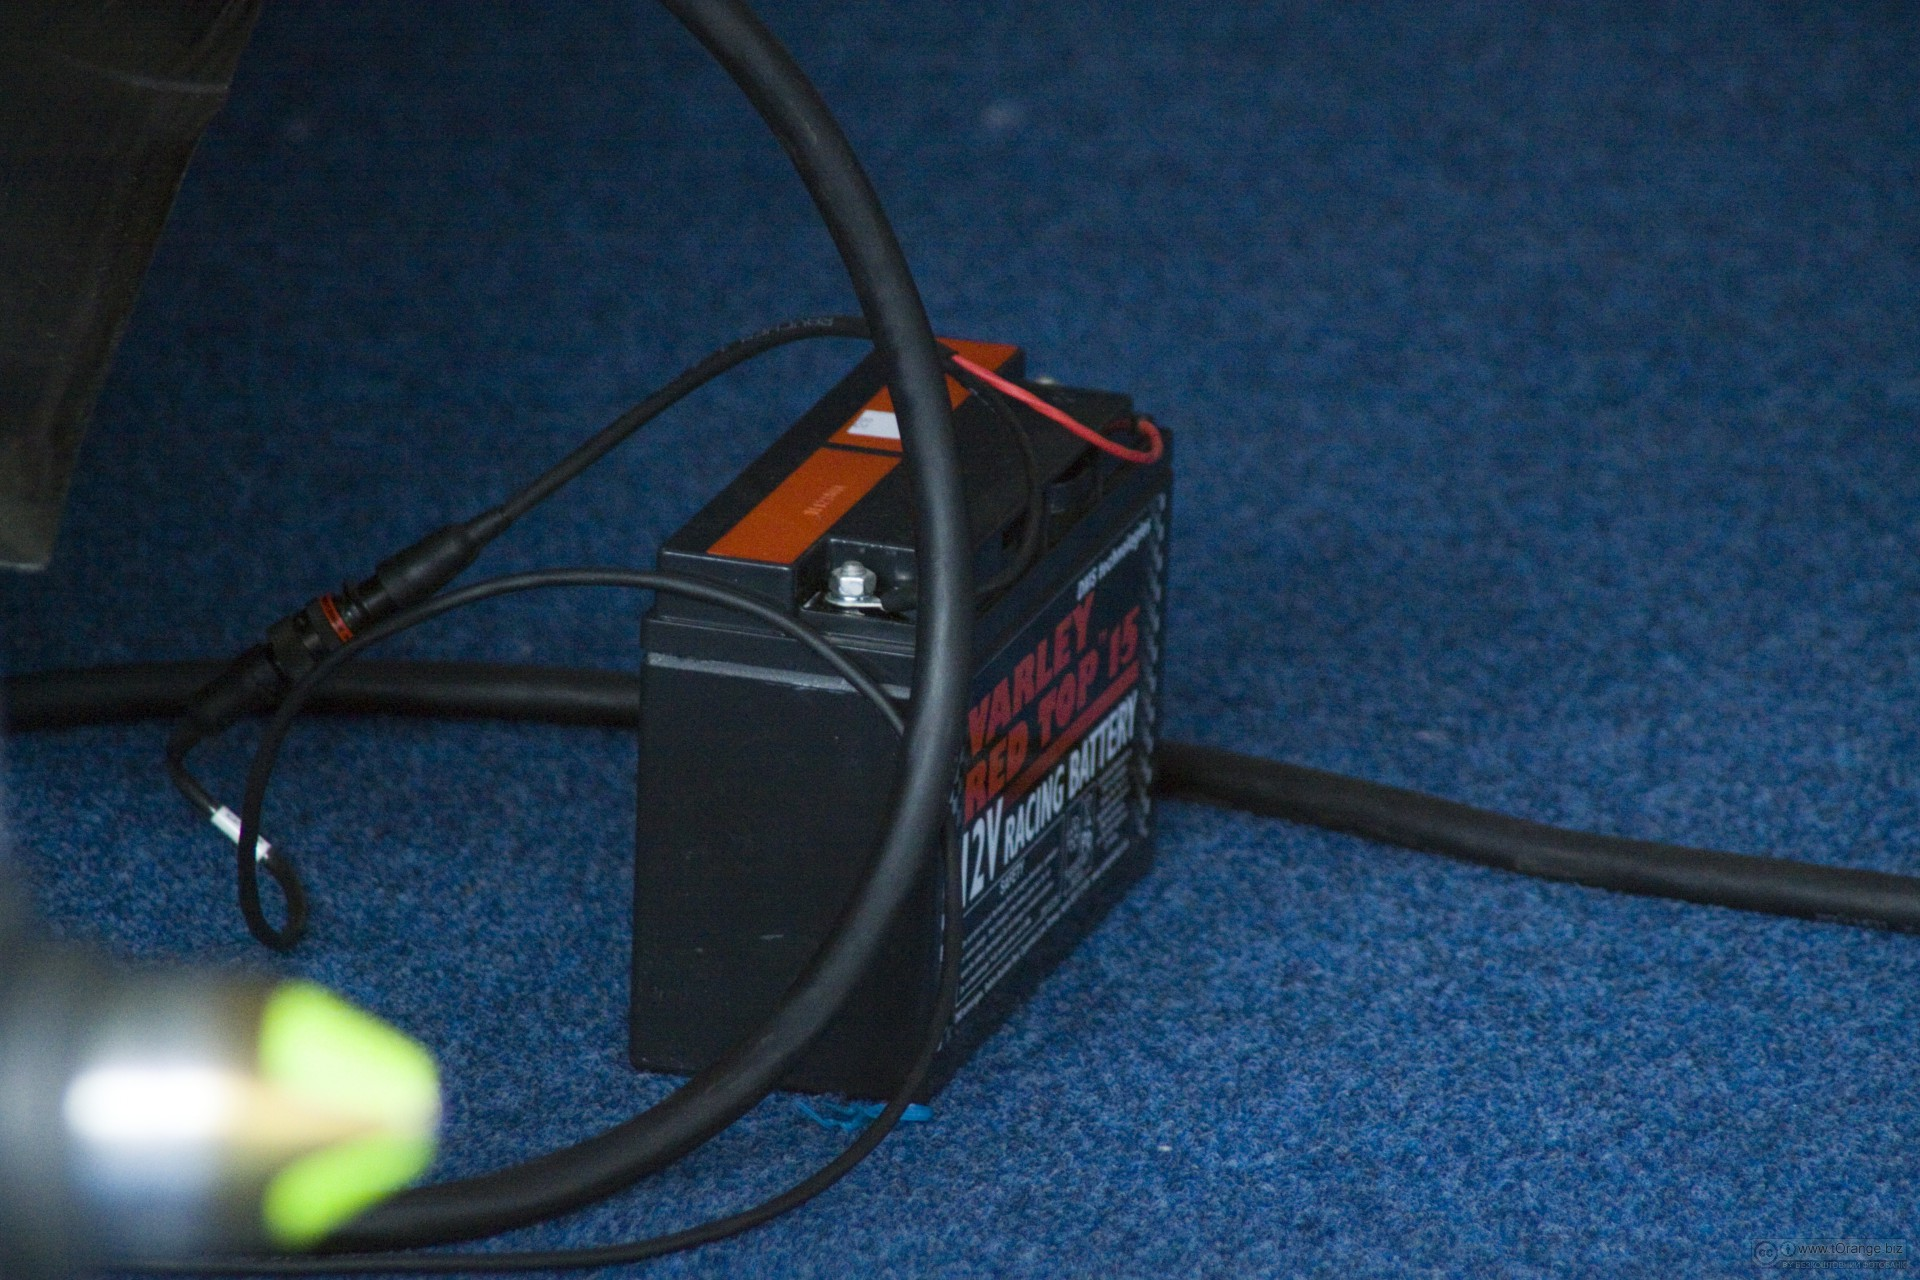 autobatterie richtig lagern autobatterie test. Black Bedroom Furniture Sets. Home Design Ideas